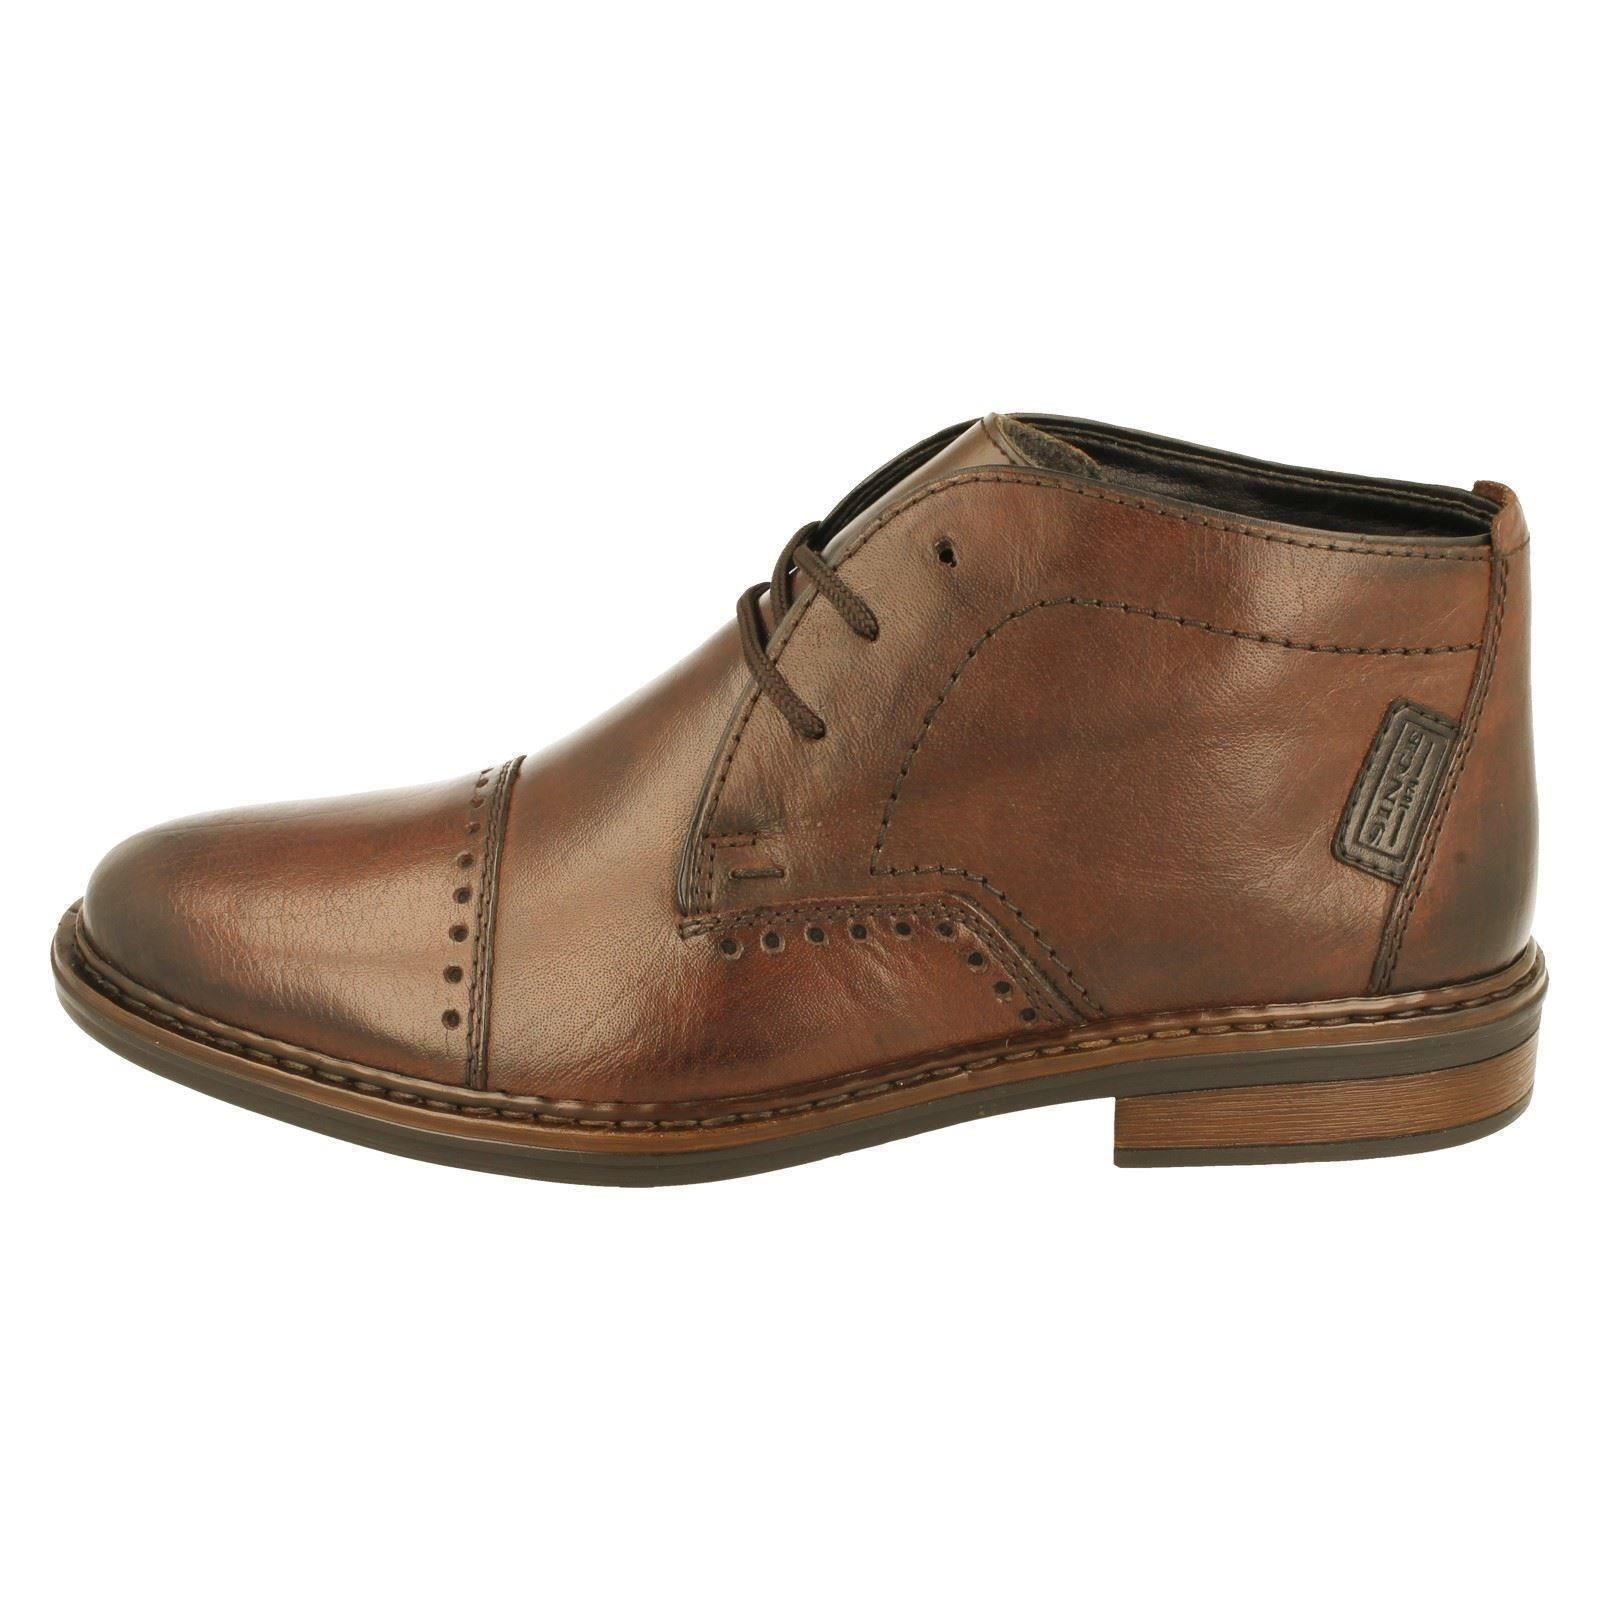 Billig Mens gute Qualität Mens Billig Rieker Boots Style 37633-W 7c18d1